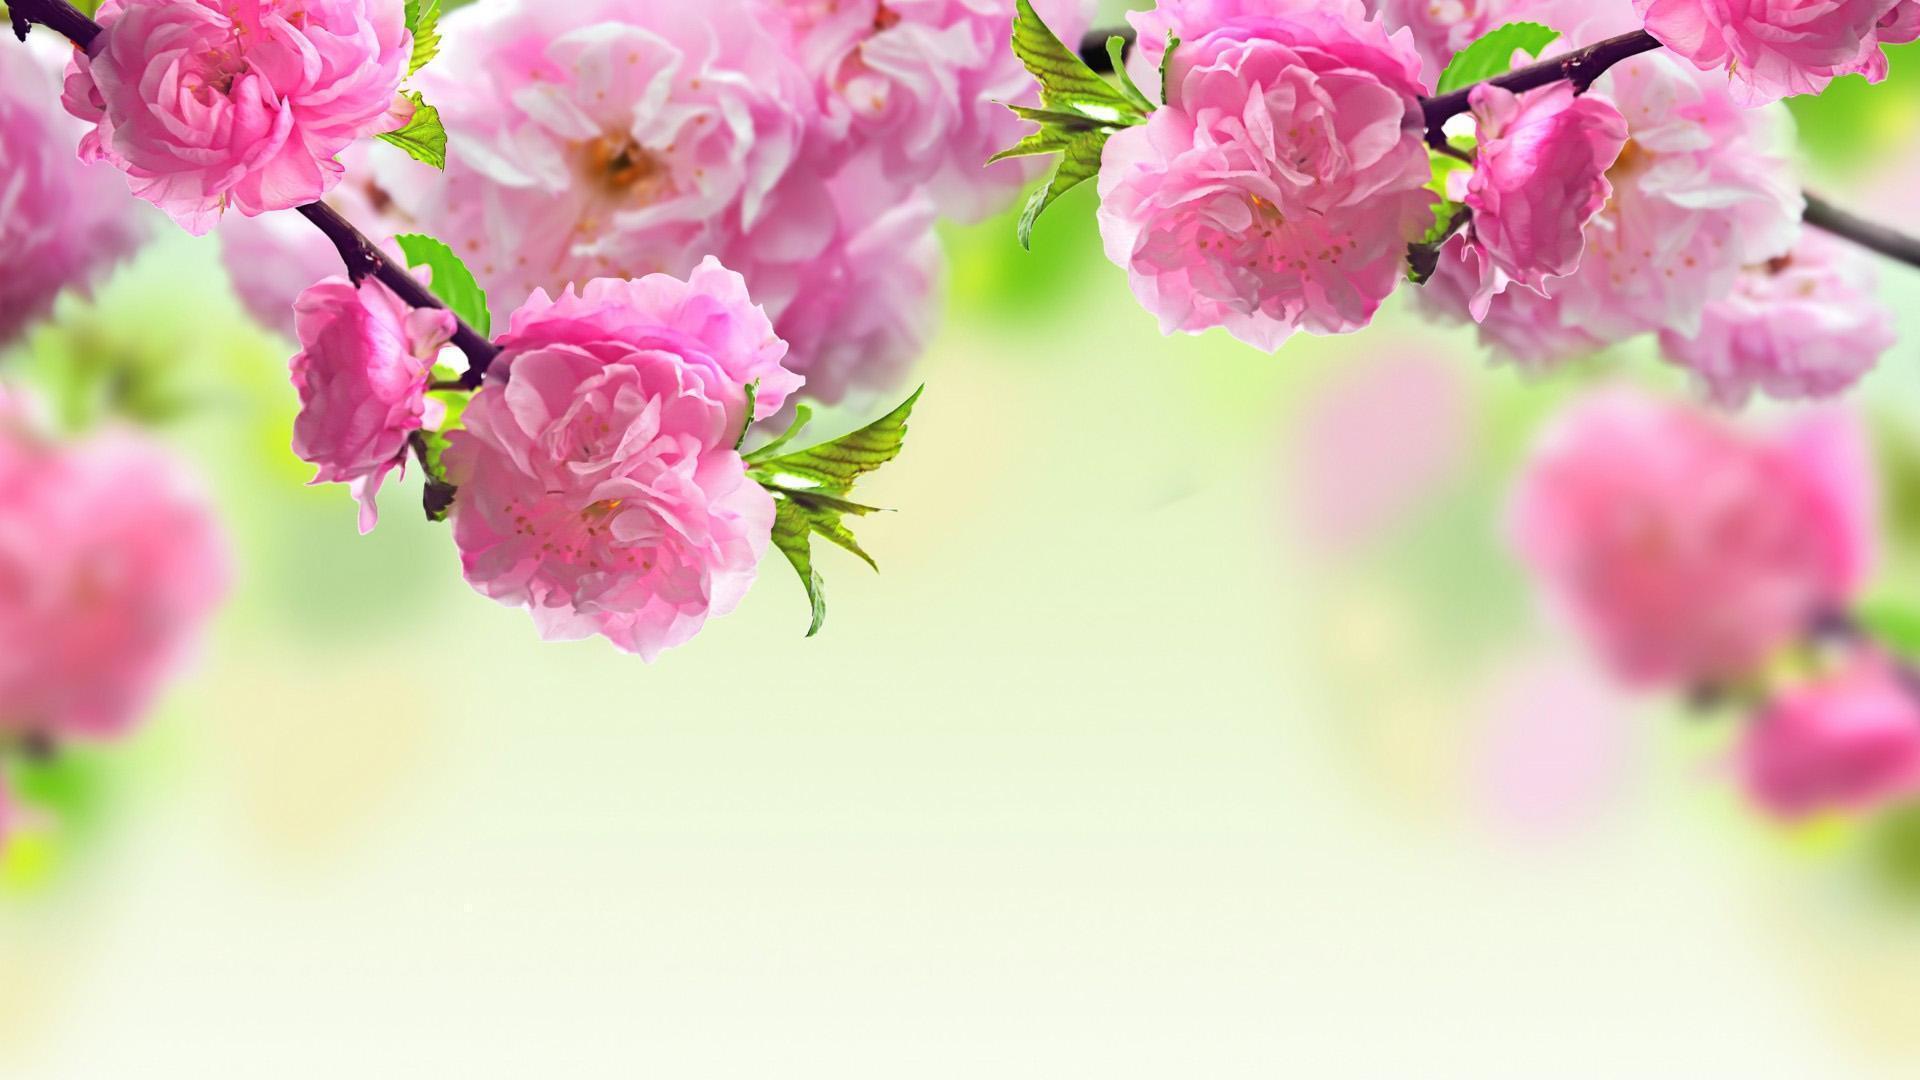 Hd wallpaper spring - Desktop Wallpaper For Spring Www